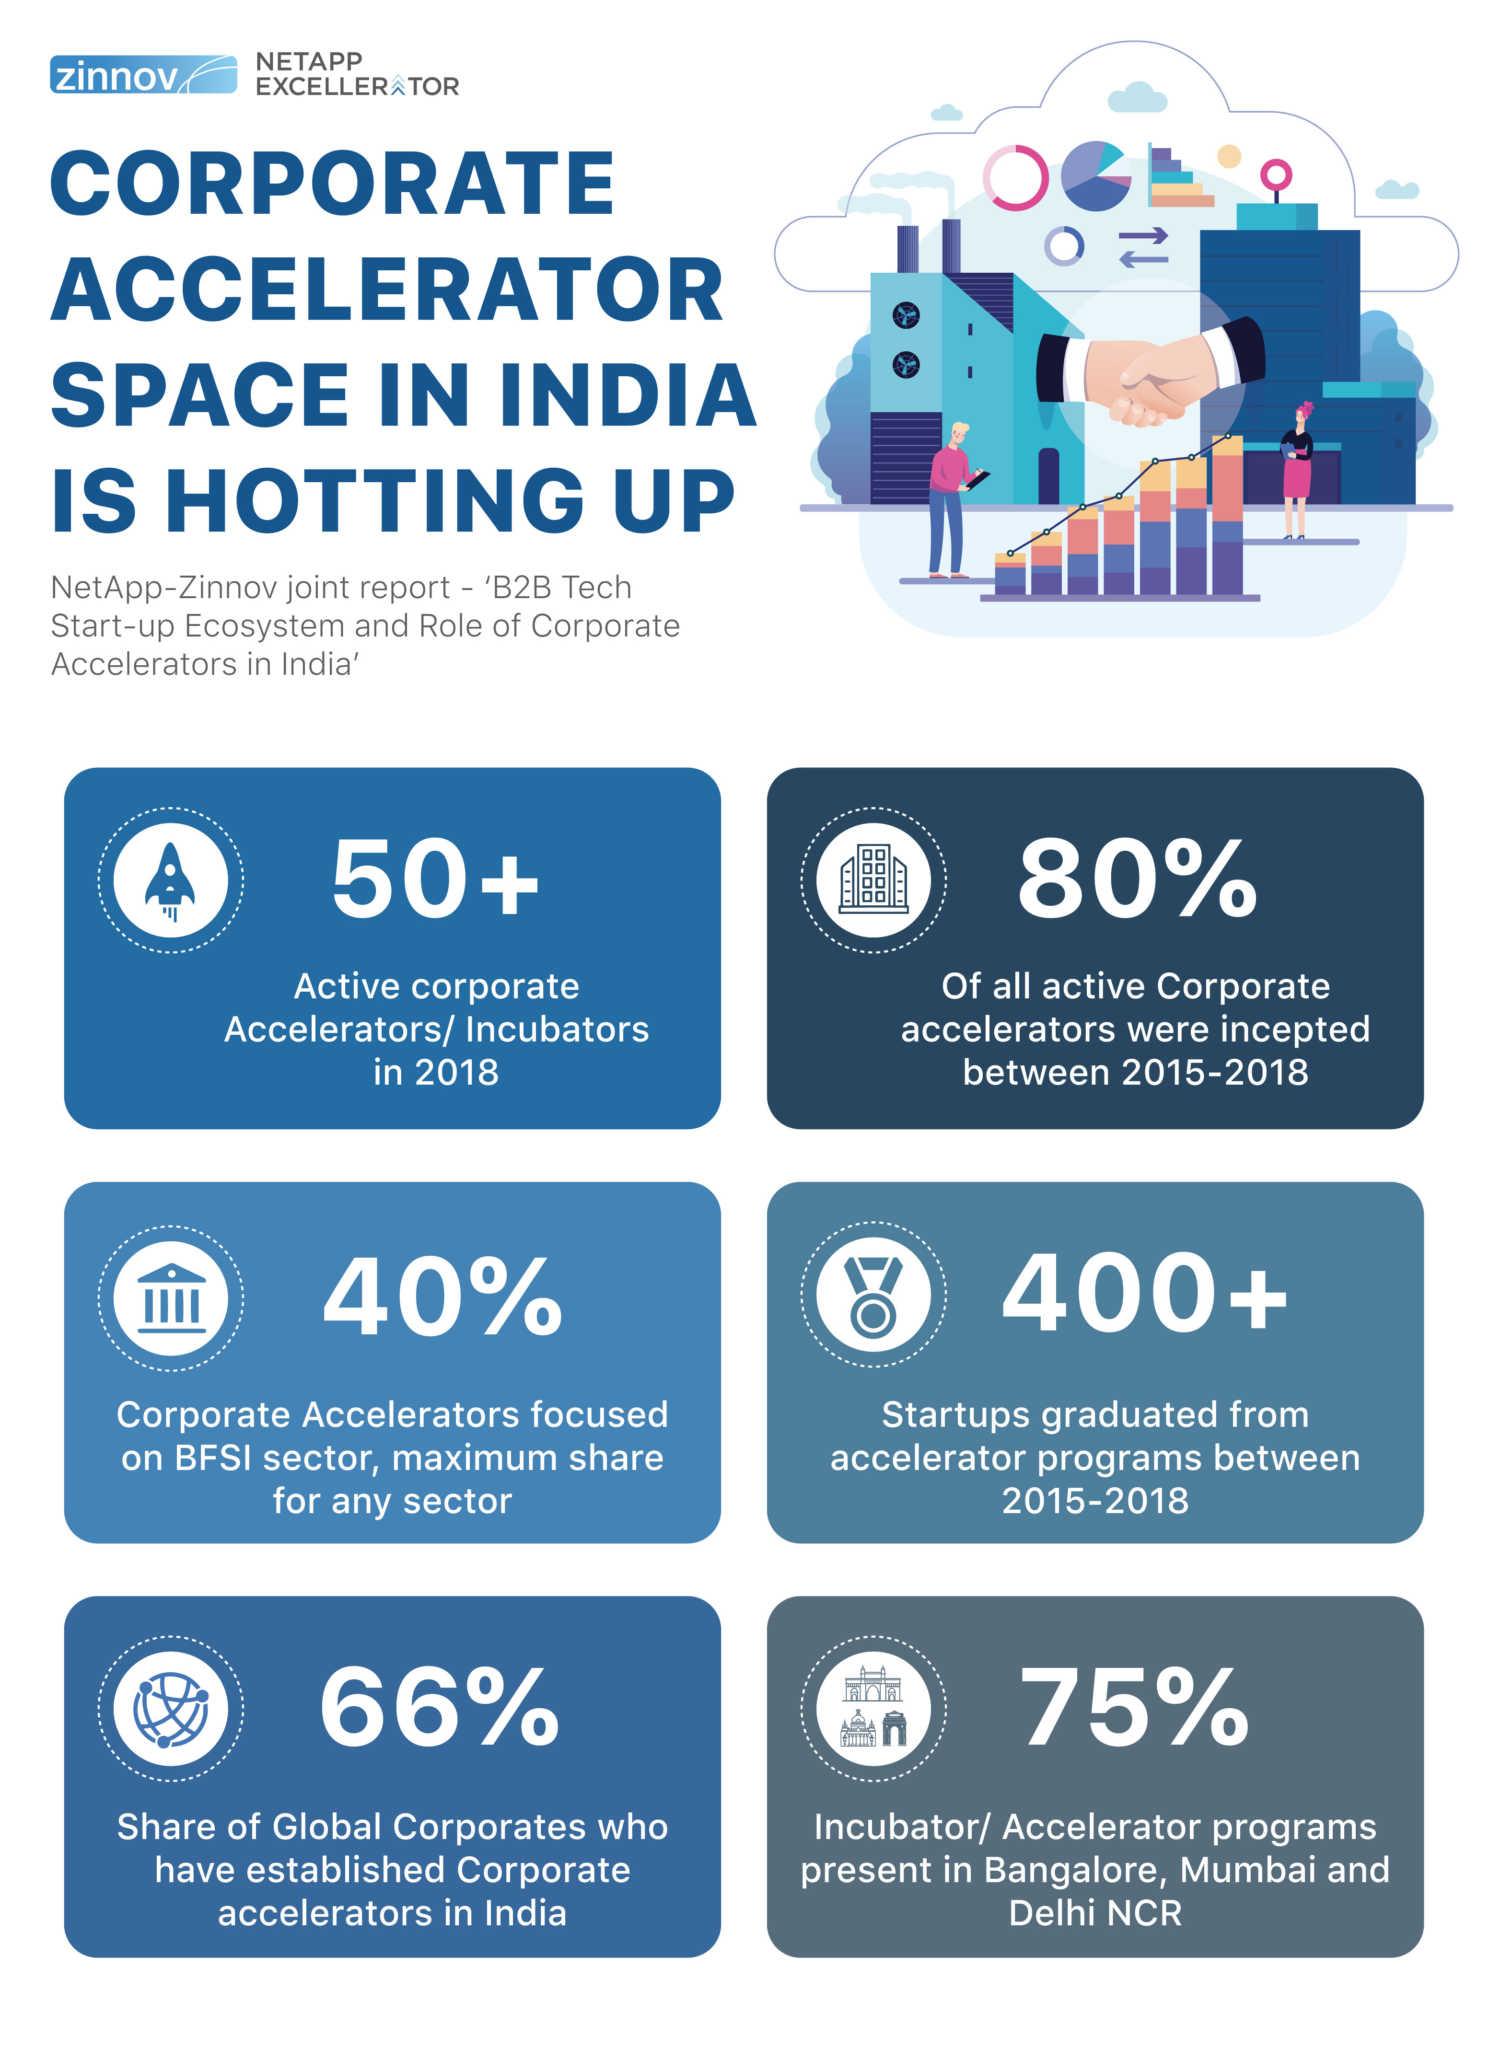 NetApp – Zinnov B2B Tech Startup Study _ Infographic 2